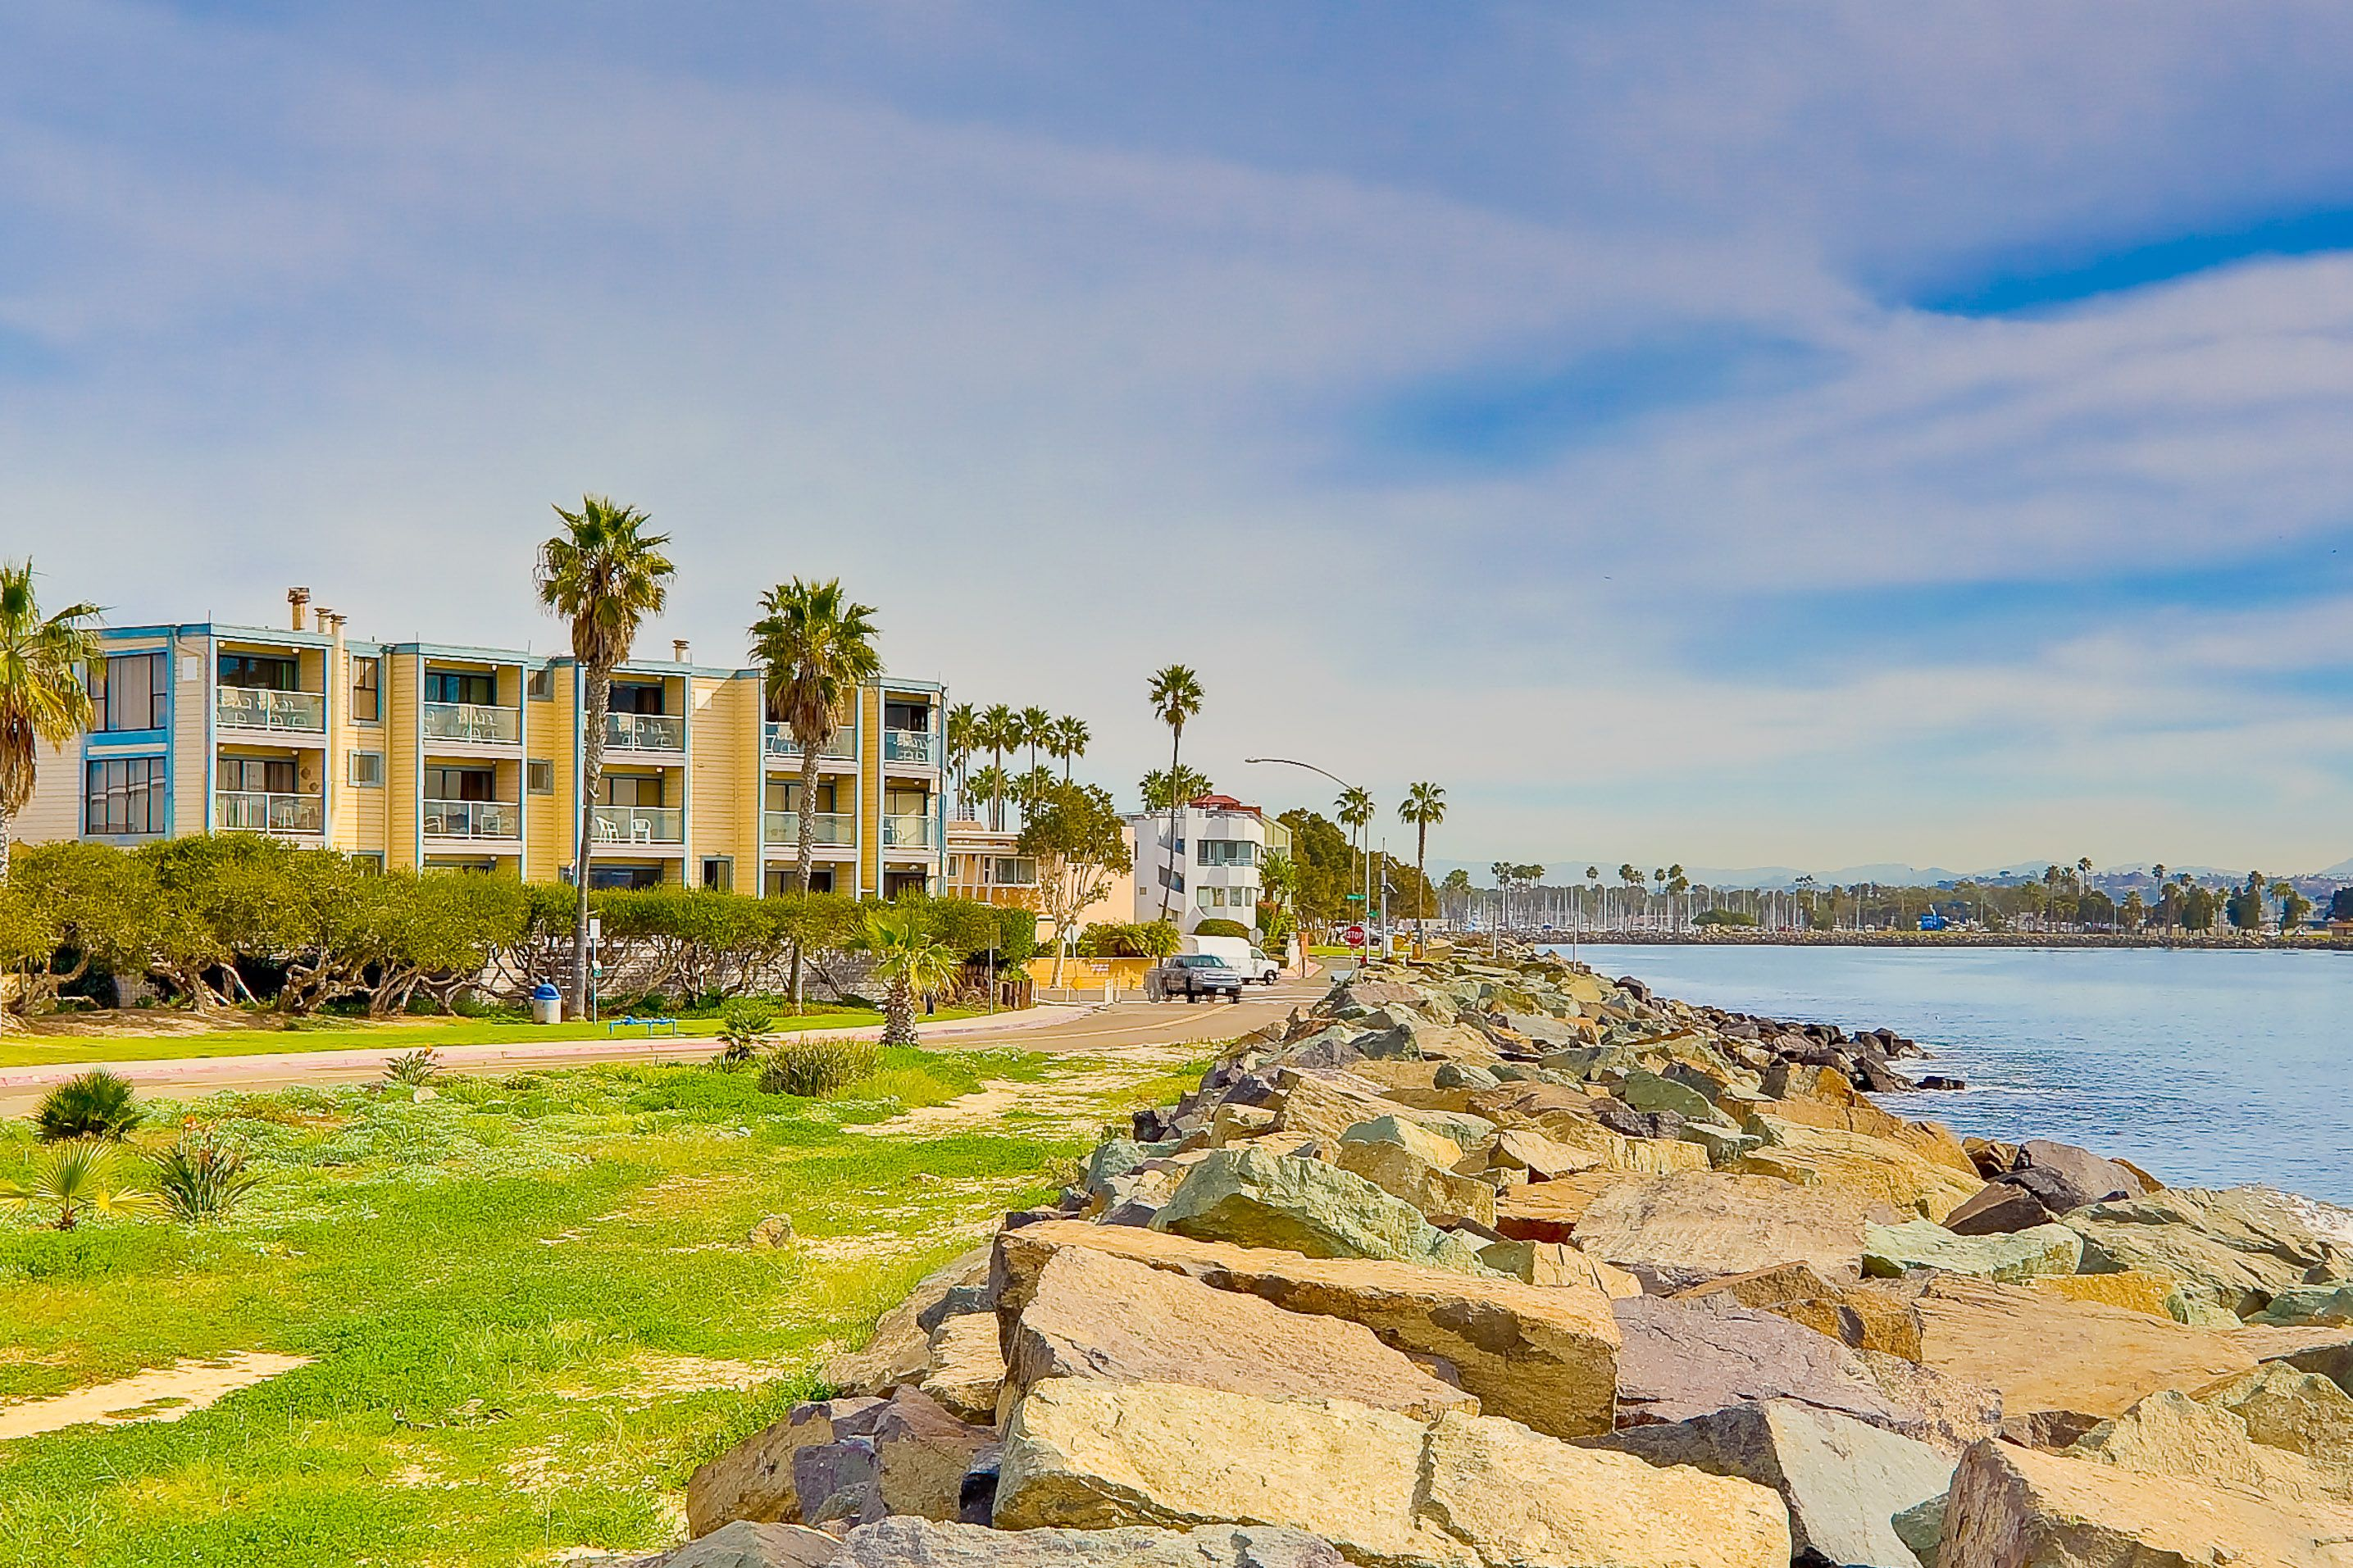 W Place, Mission Beach California